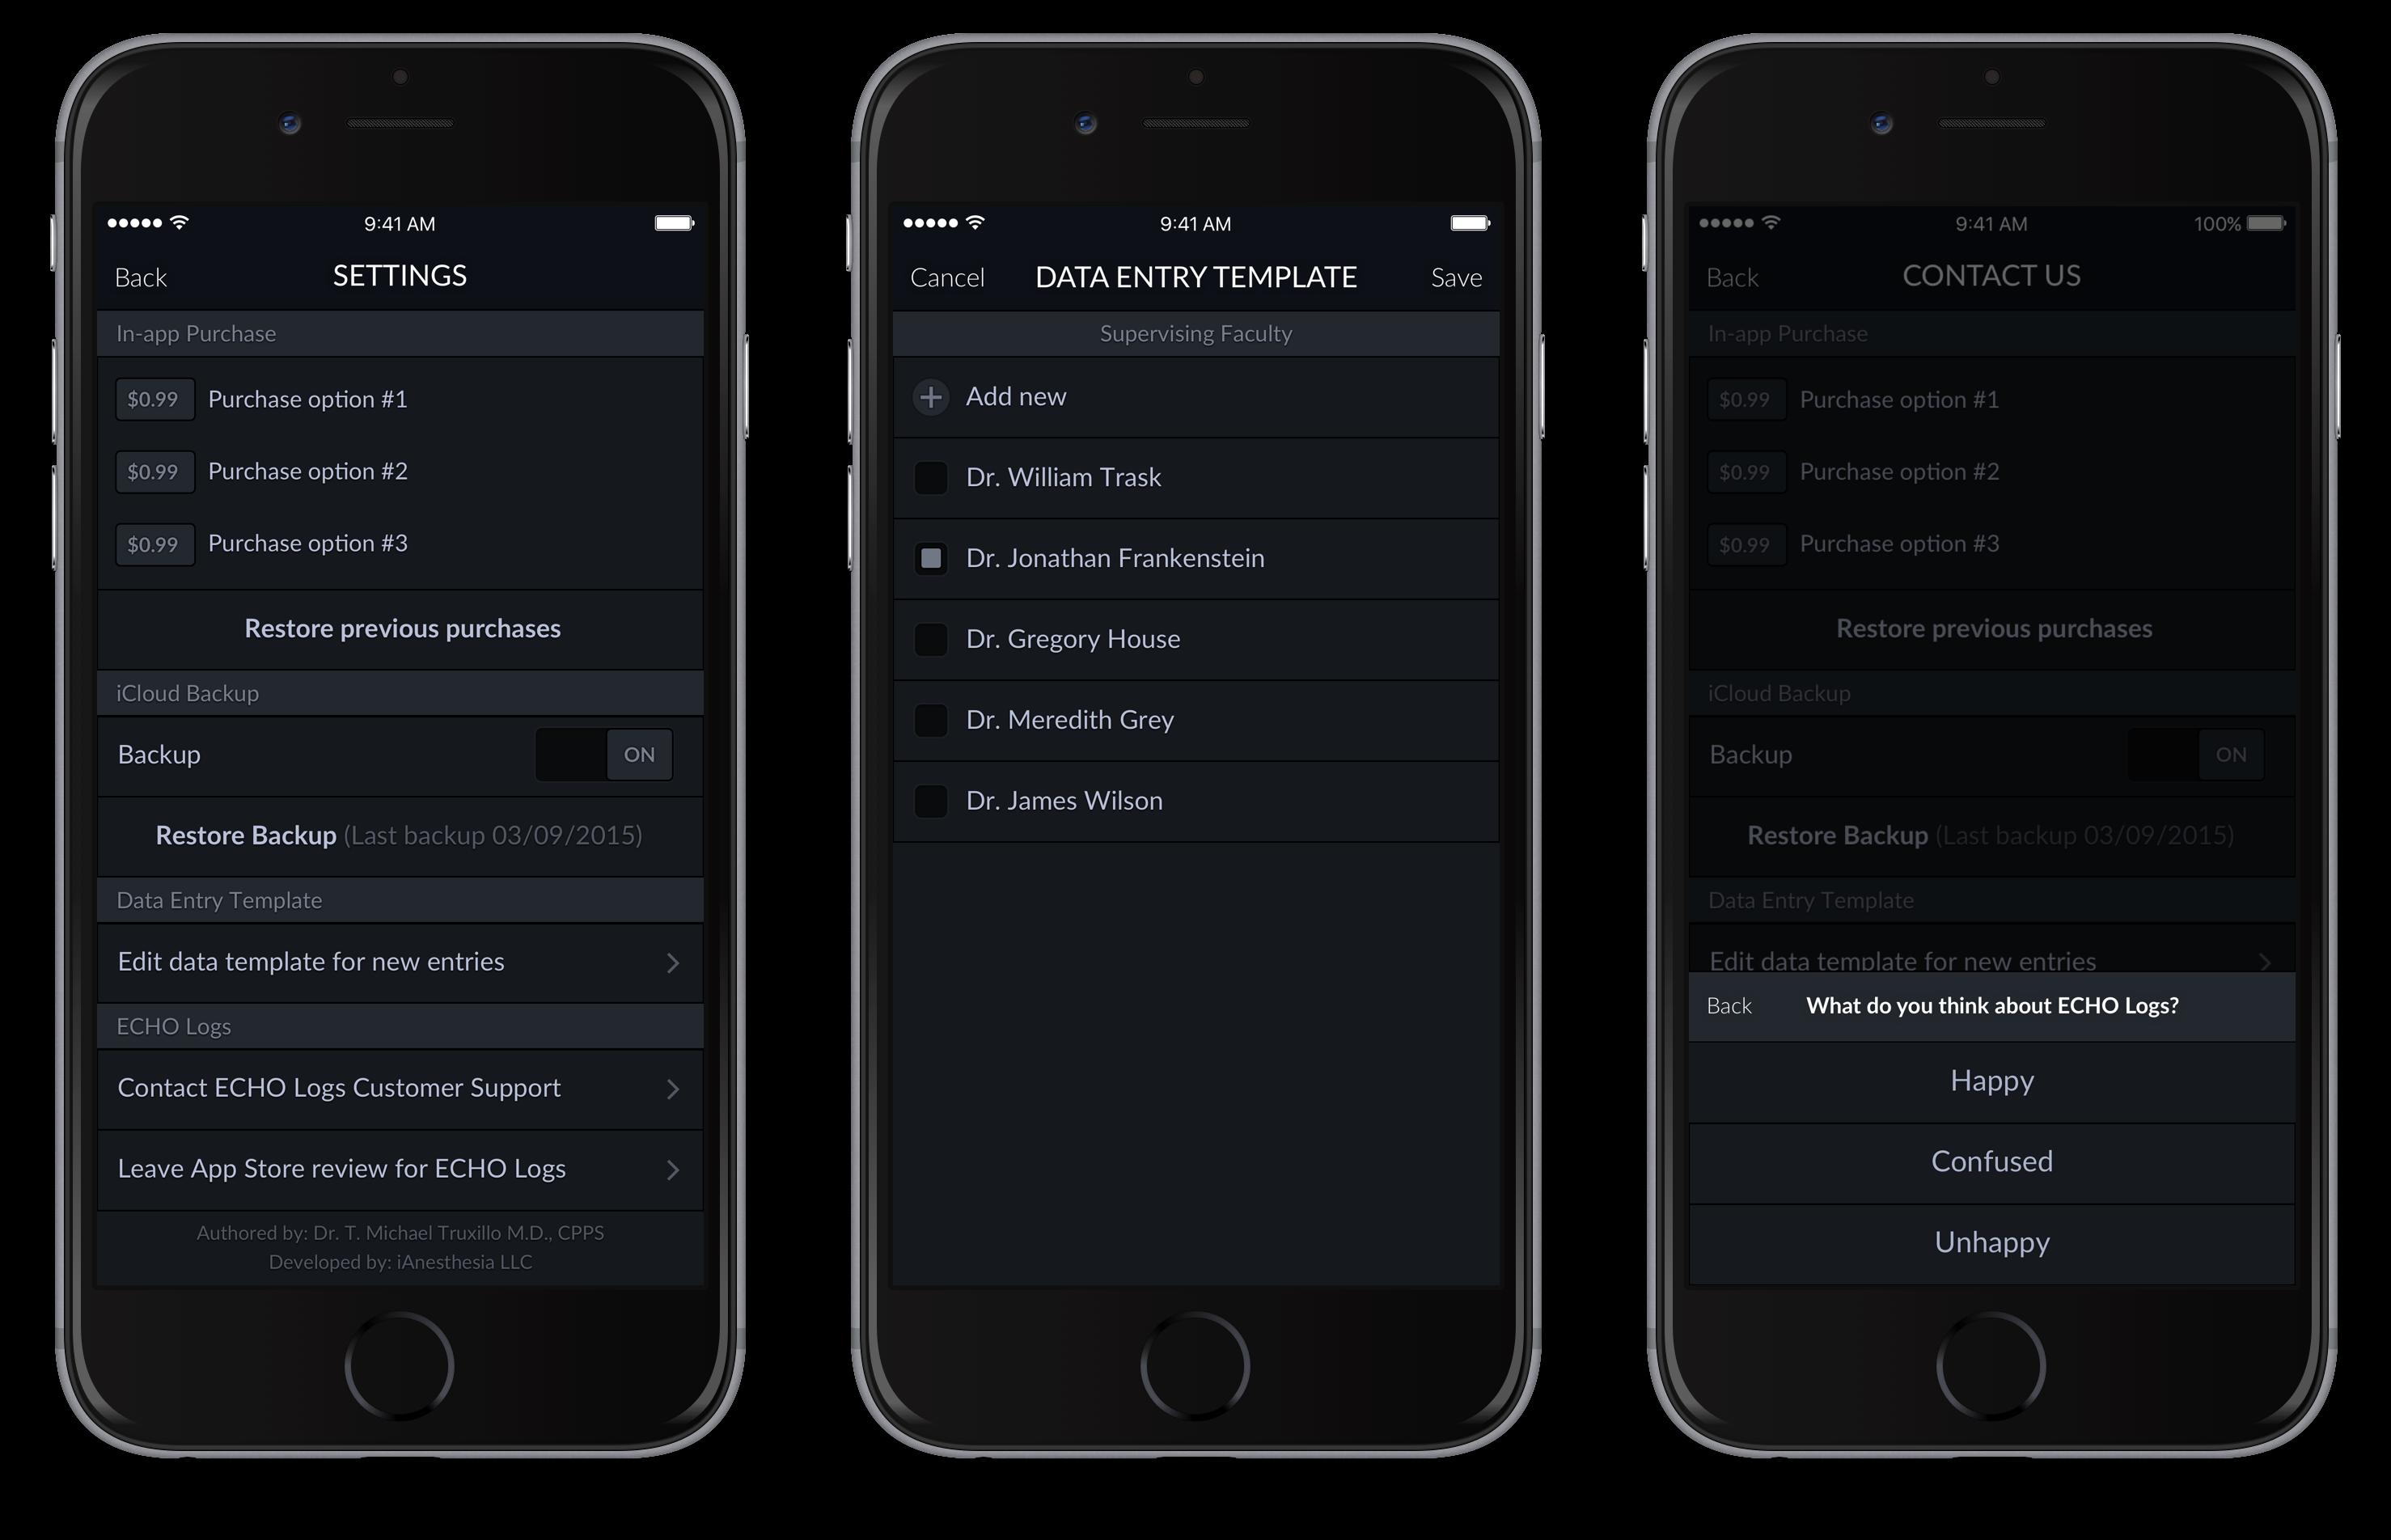 Echo Logs – iPhone 6